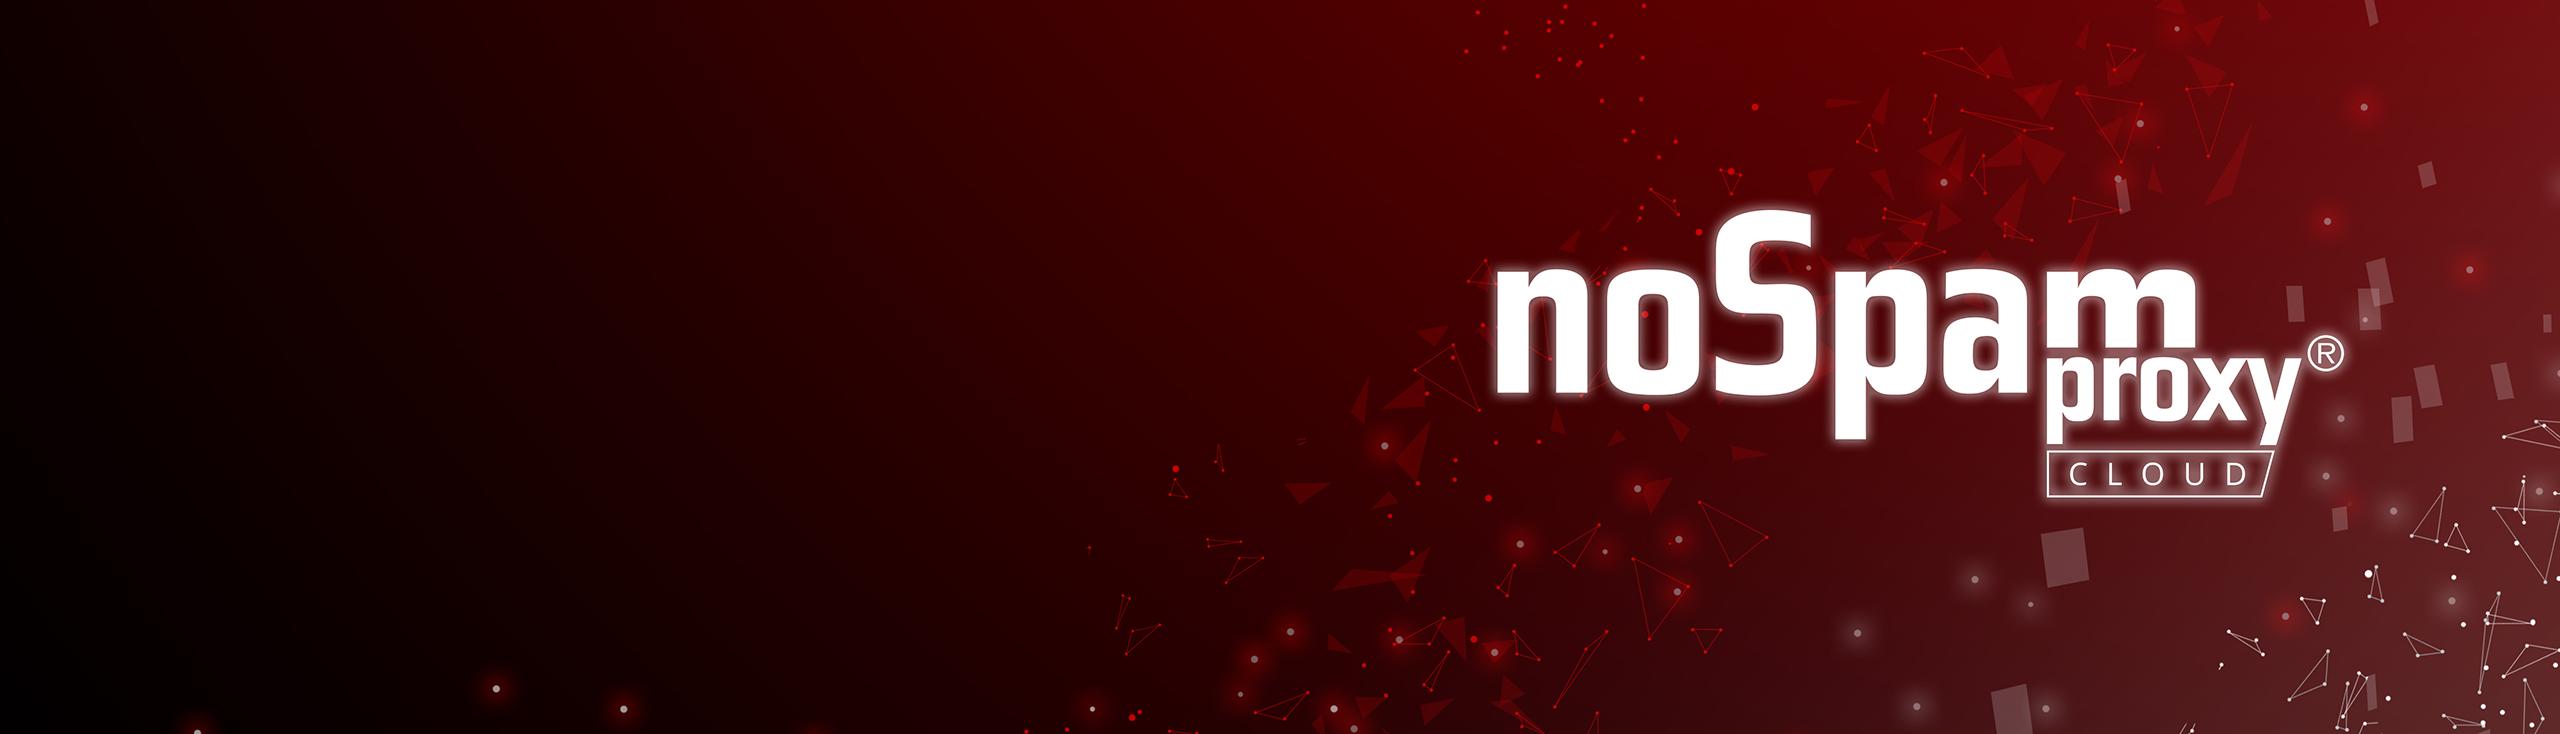 NoSpamProxy Cloud Slider